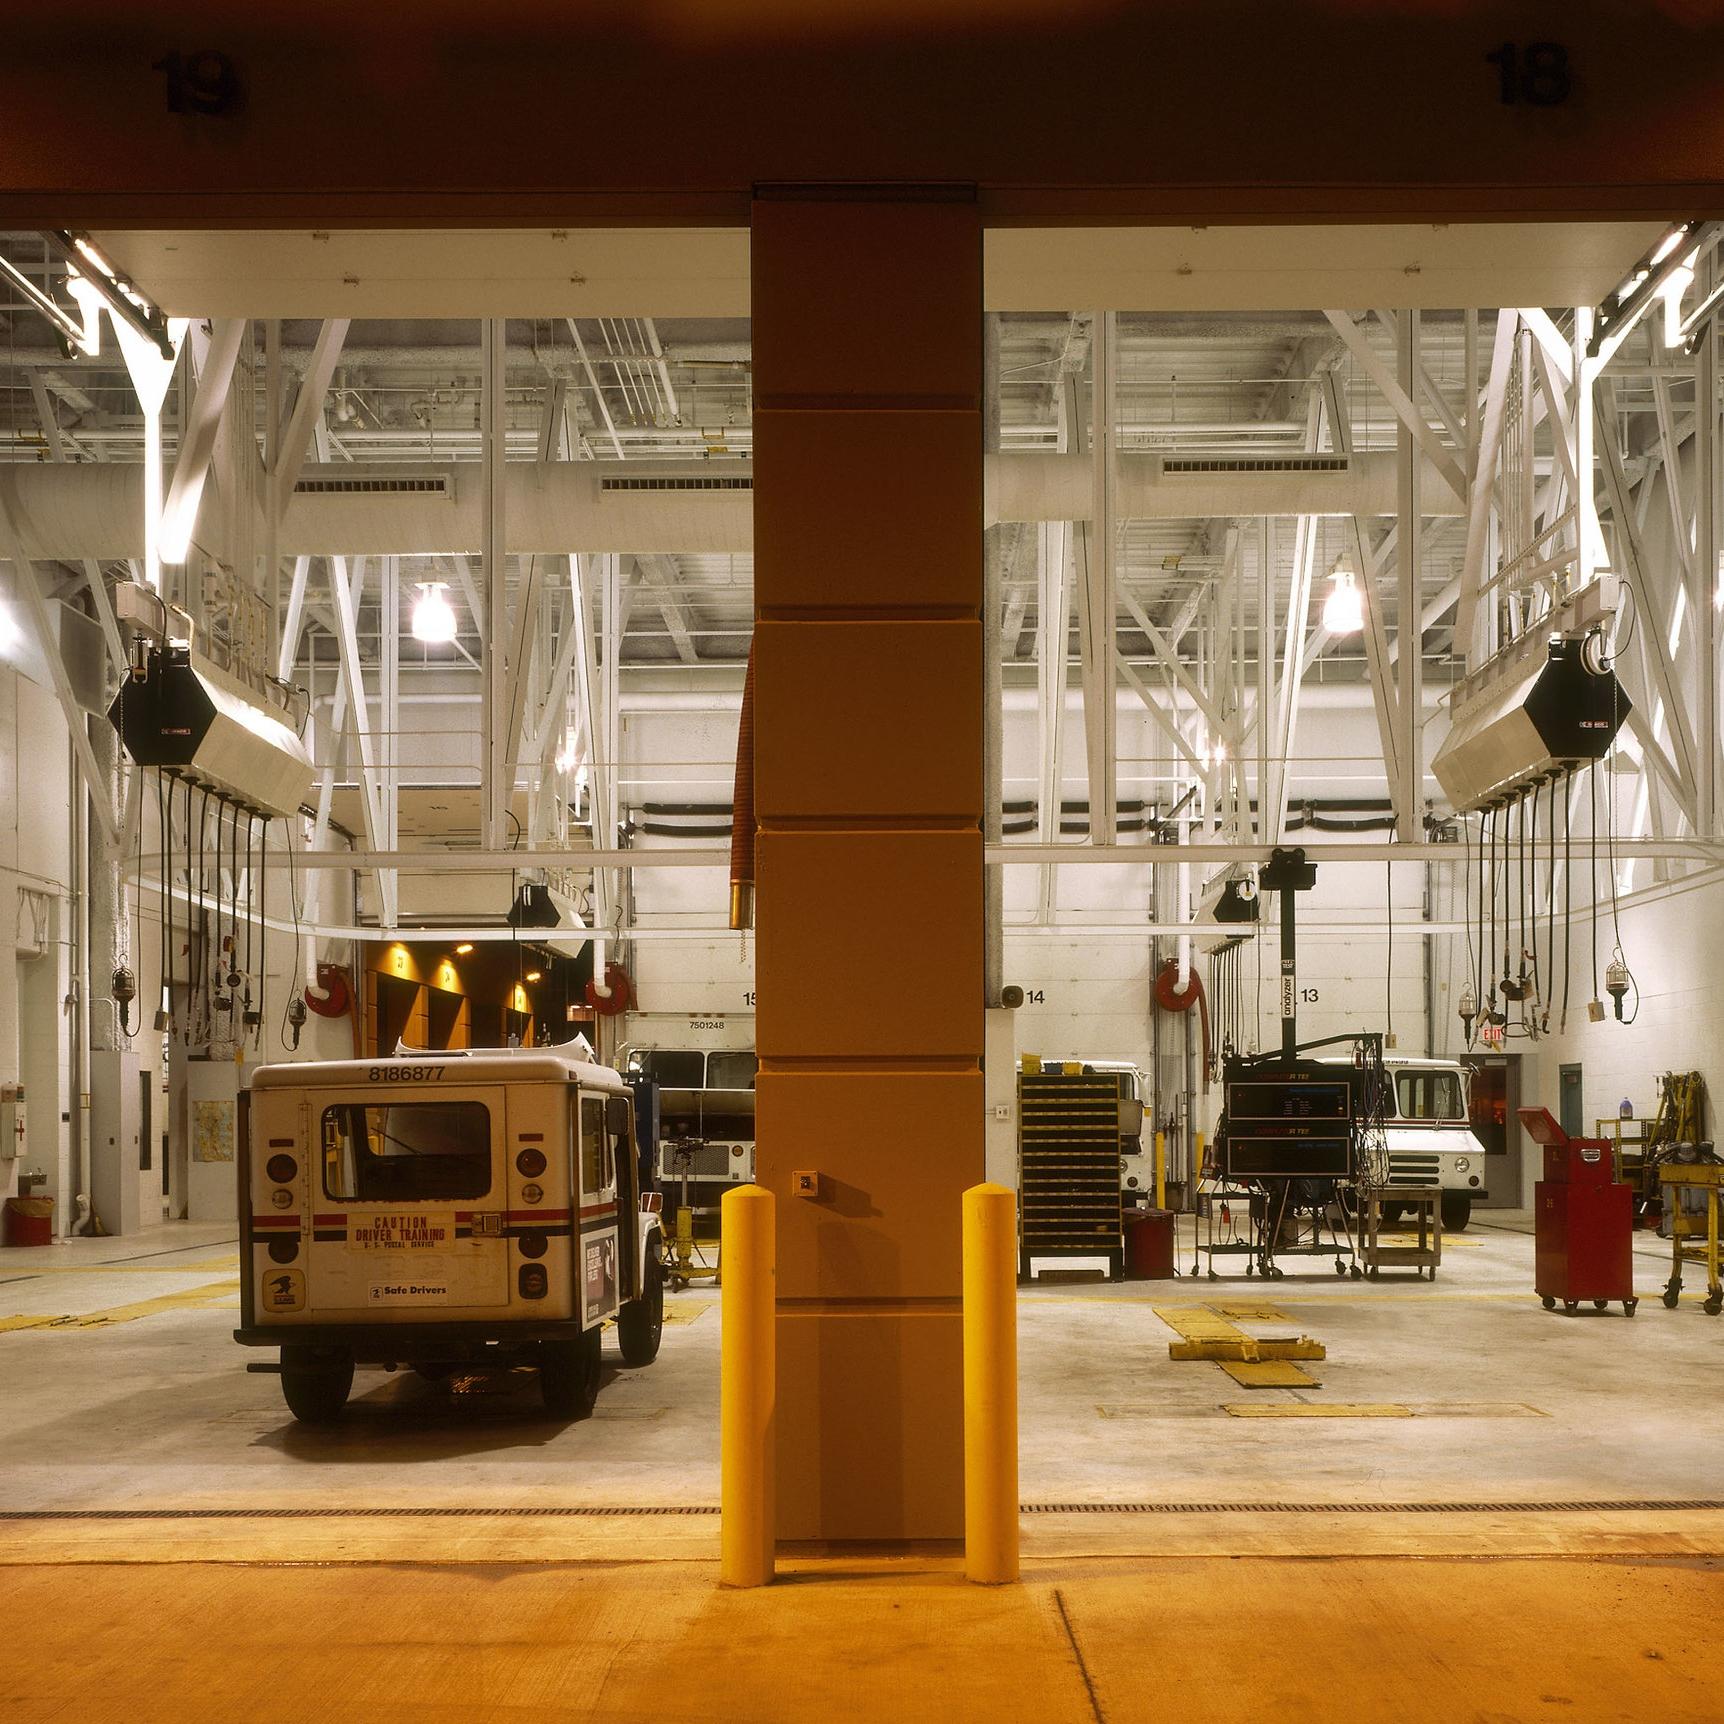 USPS Vehicle Maintenance Facility  102.jpg